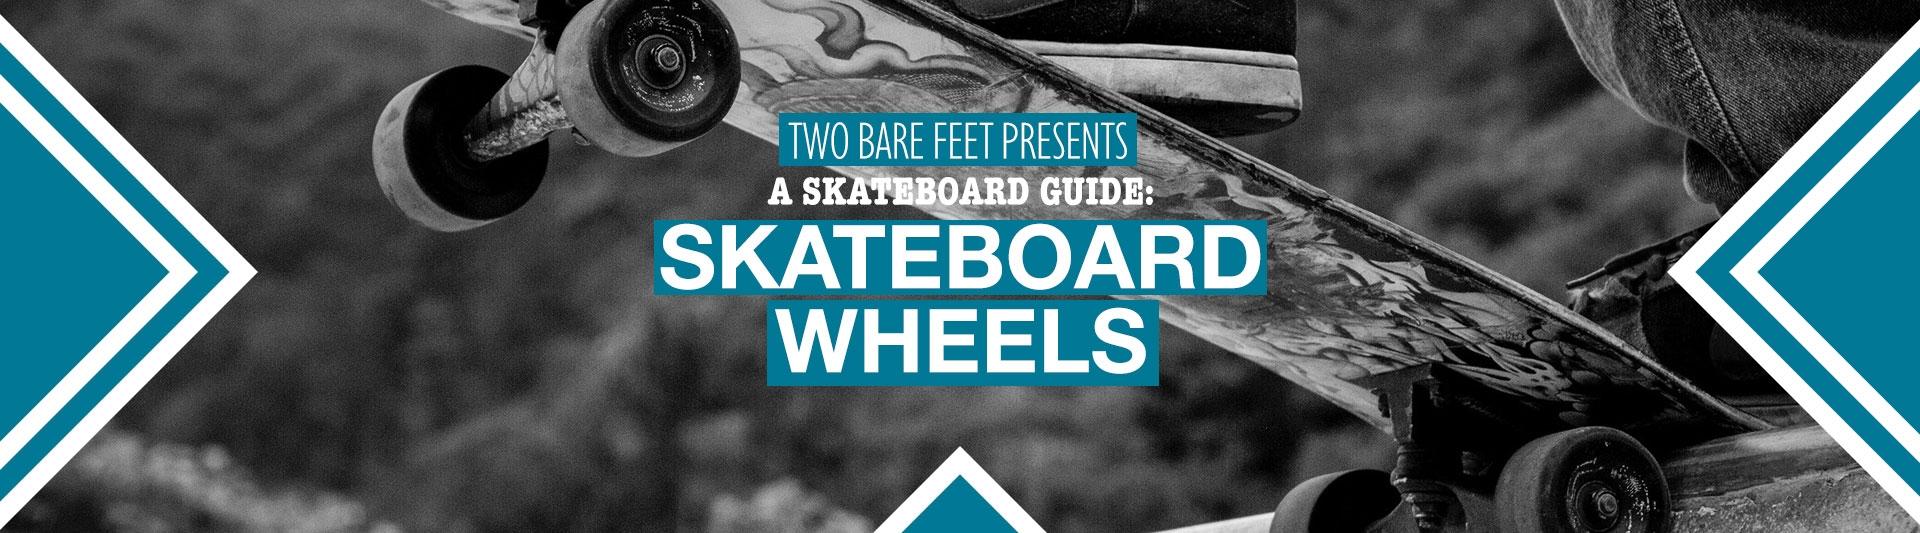 Skateboard Wheels banner